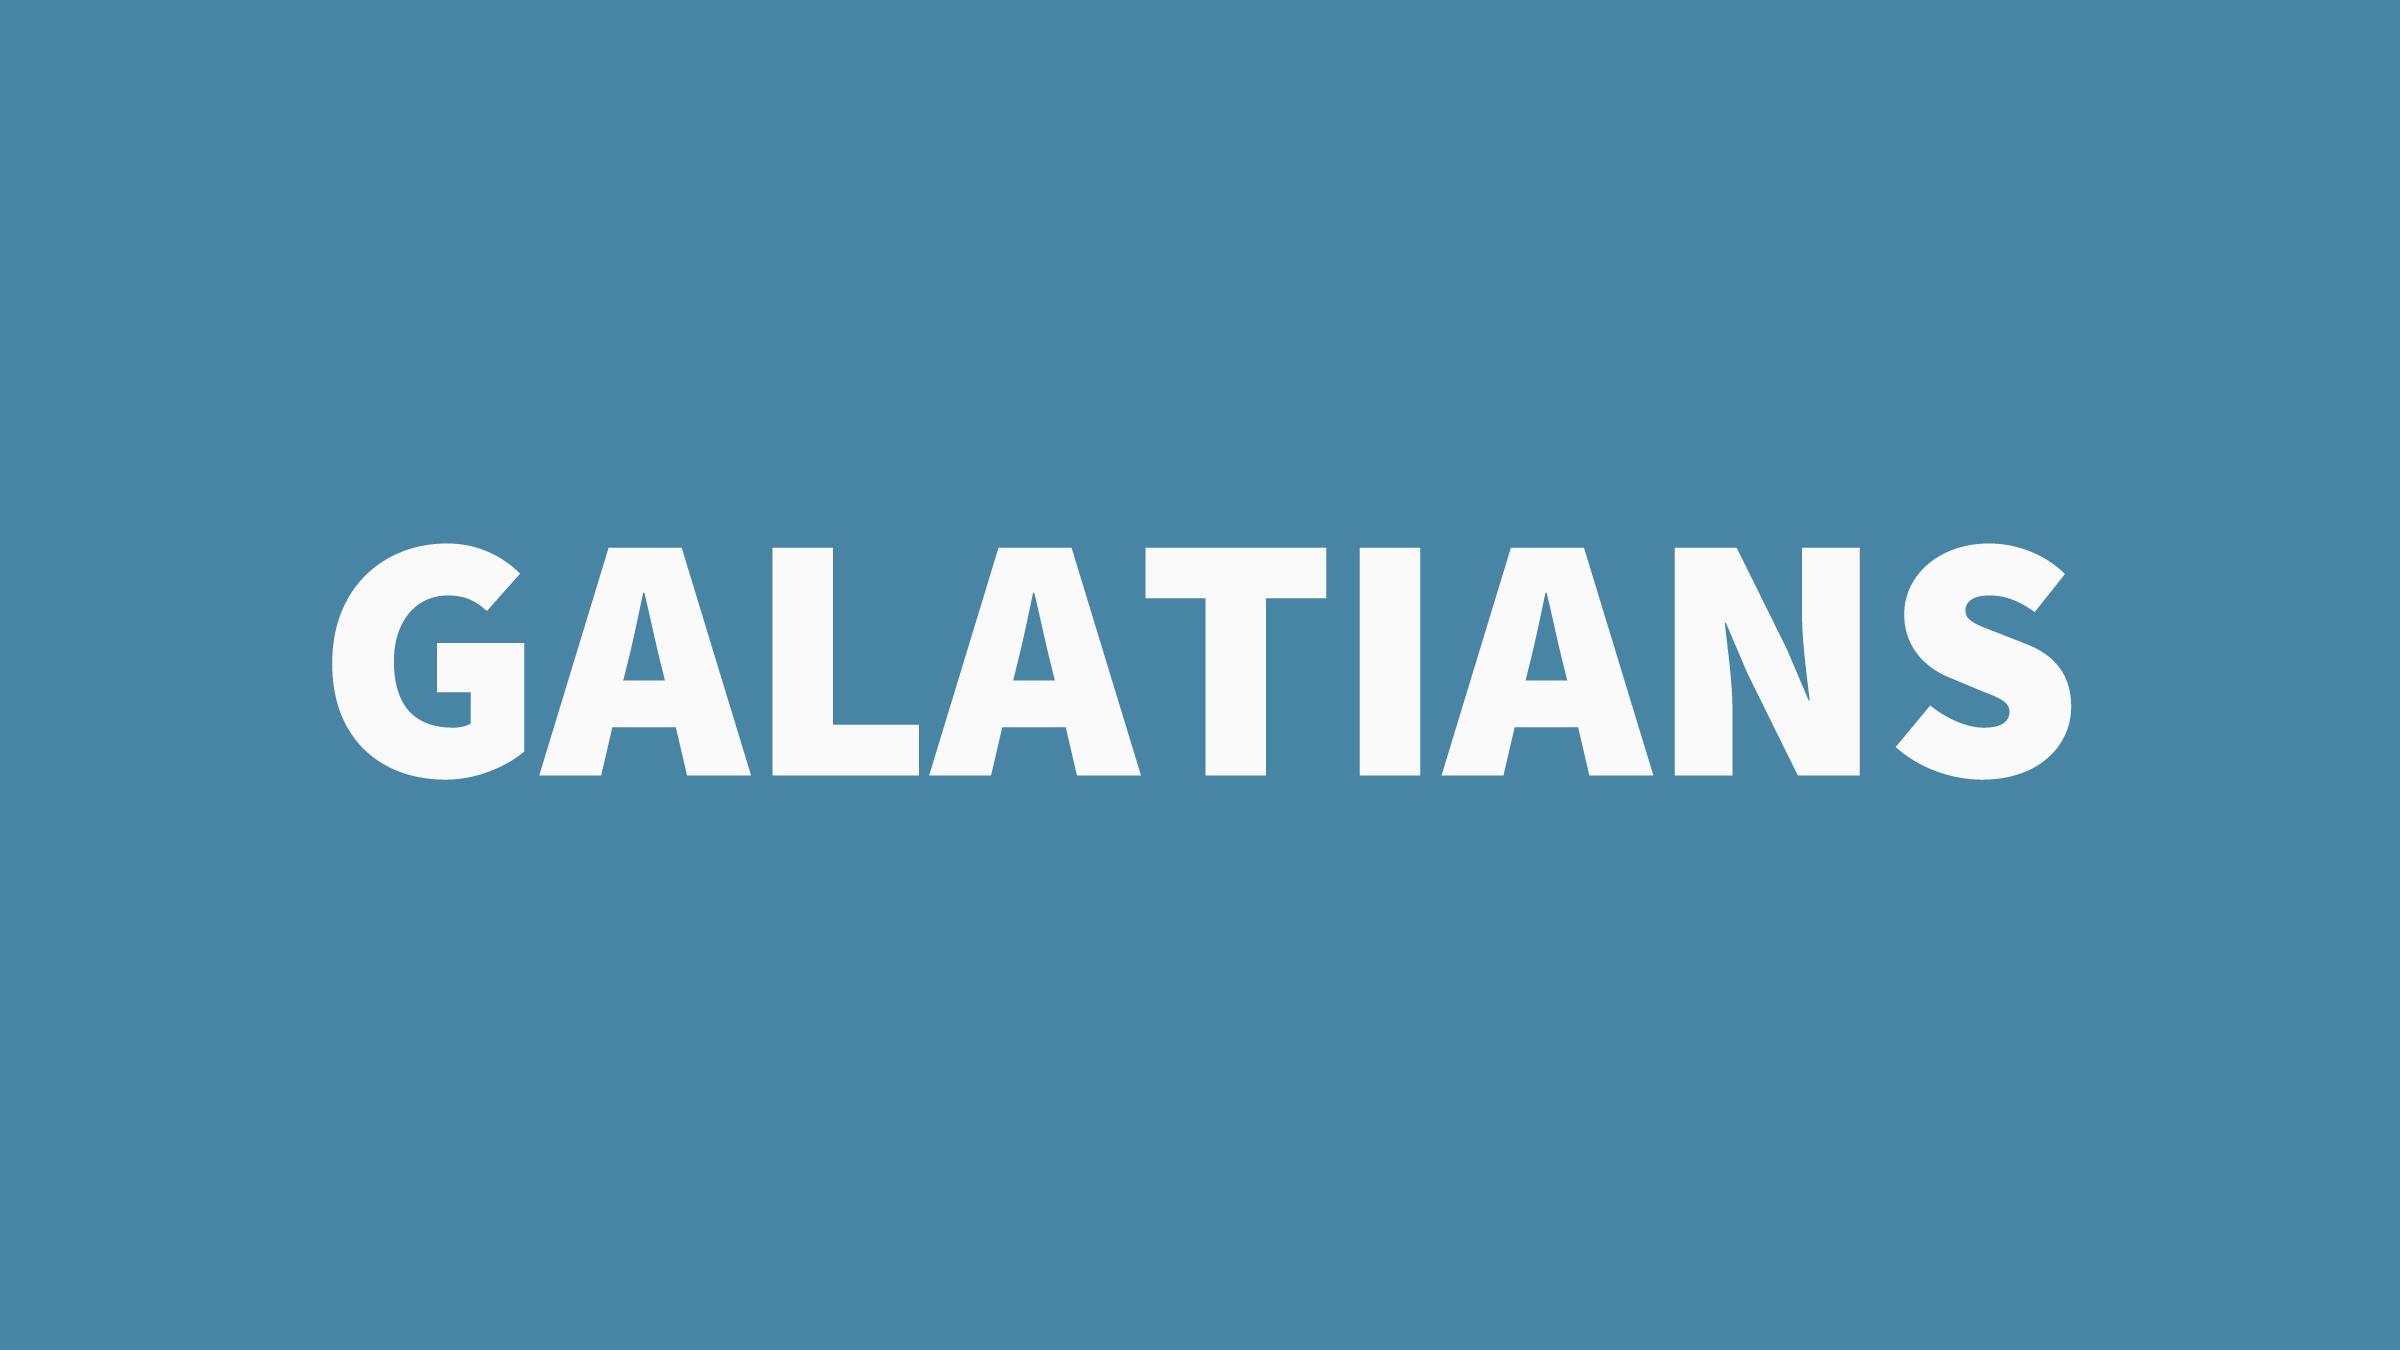 Galatians.jpeg